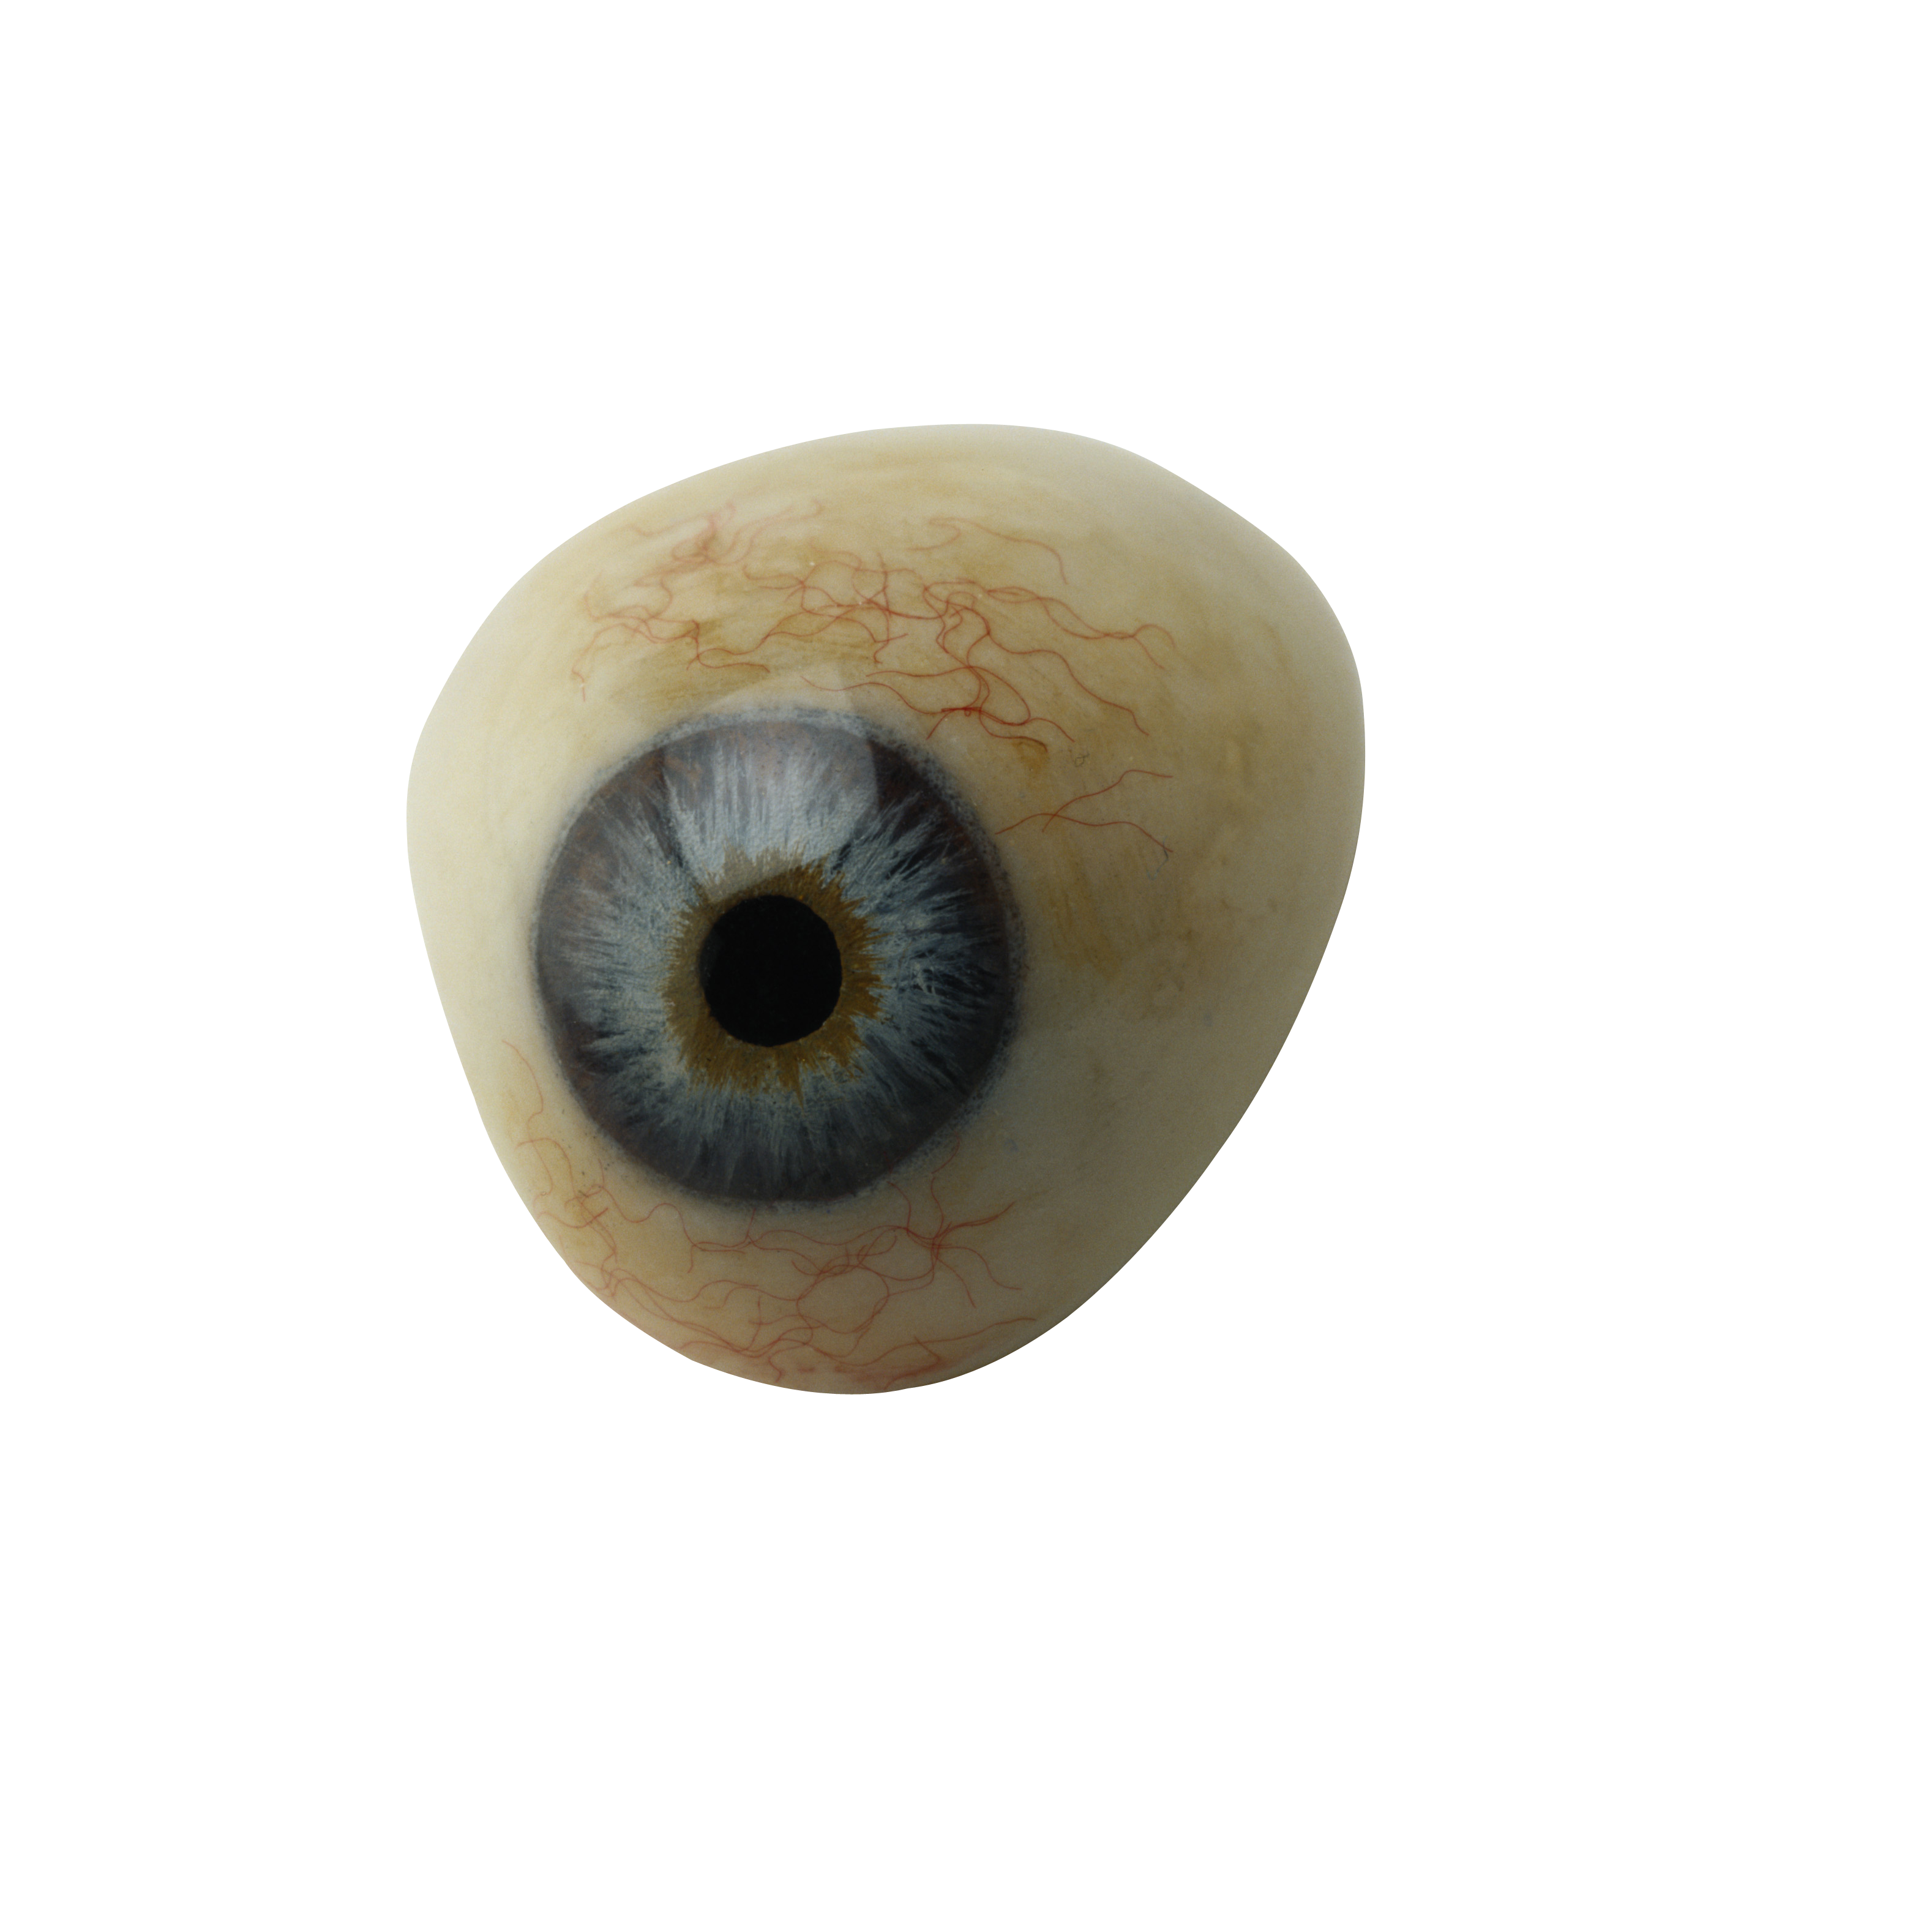 Eye Transparent Png By Absurdwordpreferred On Deviantart